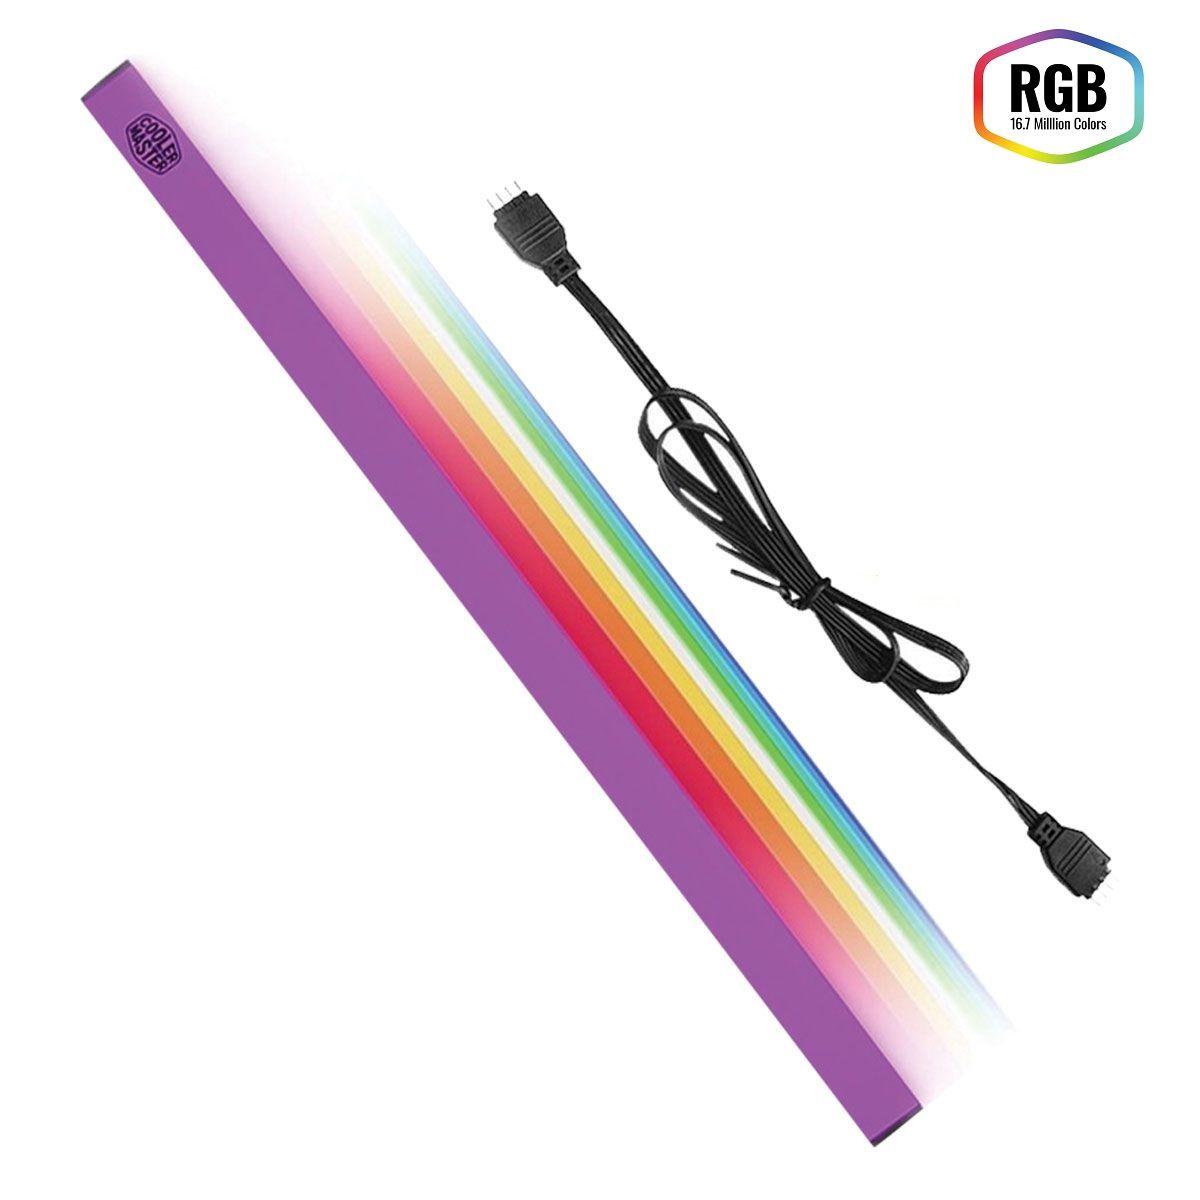 Tira de Led Magnética Universal com RGB MCA-U000R-CLS000 - Cooler Master